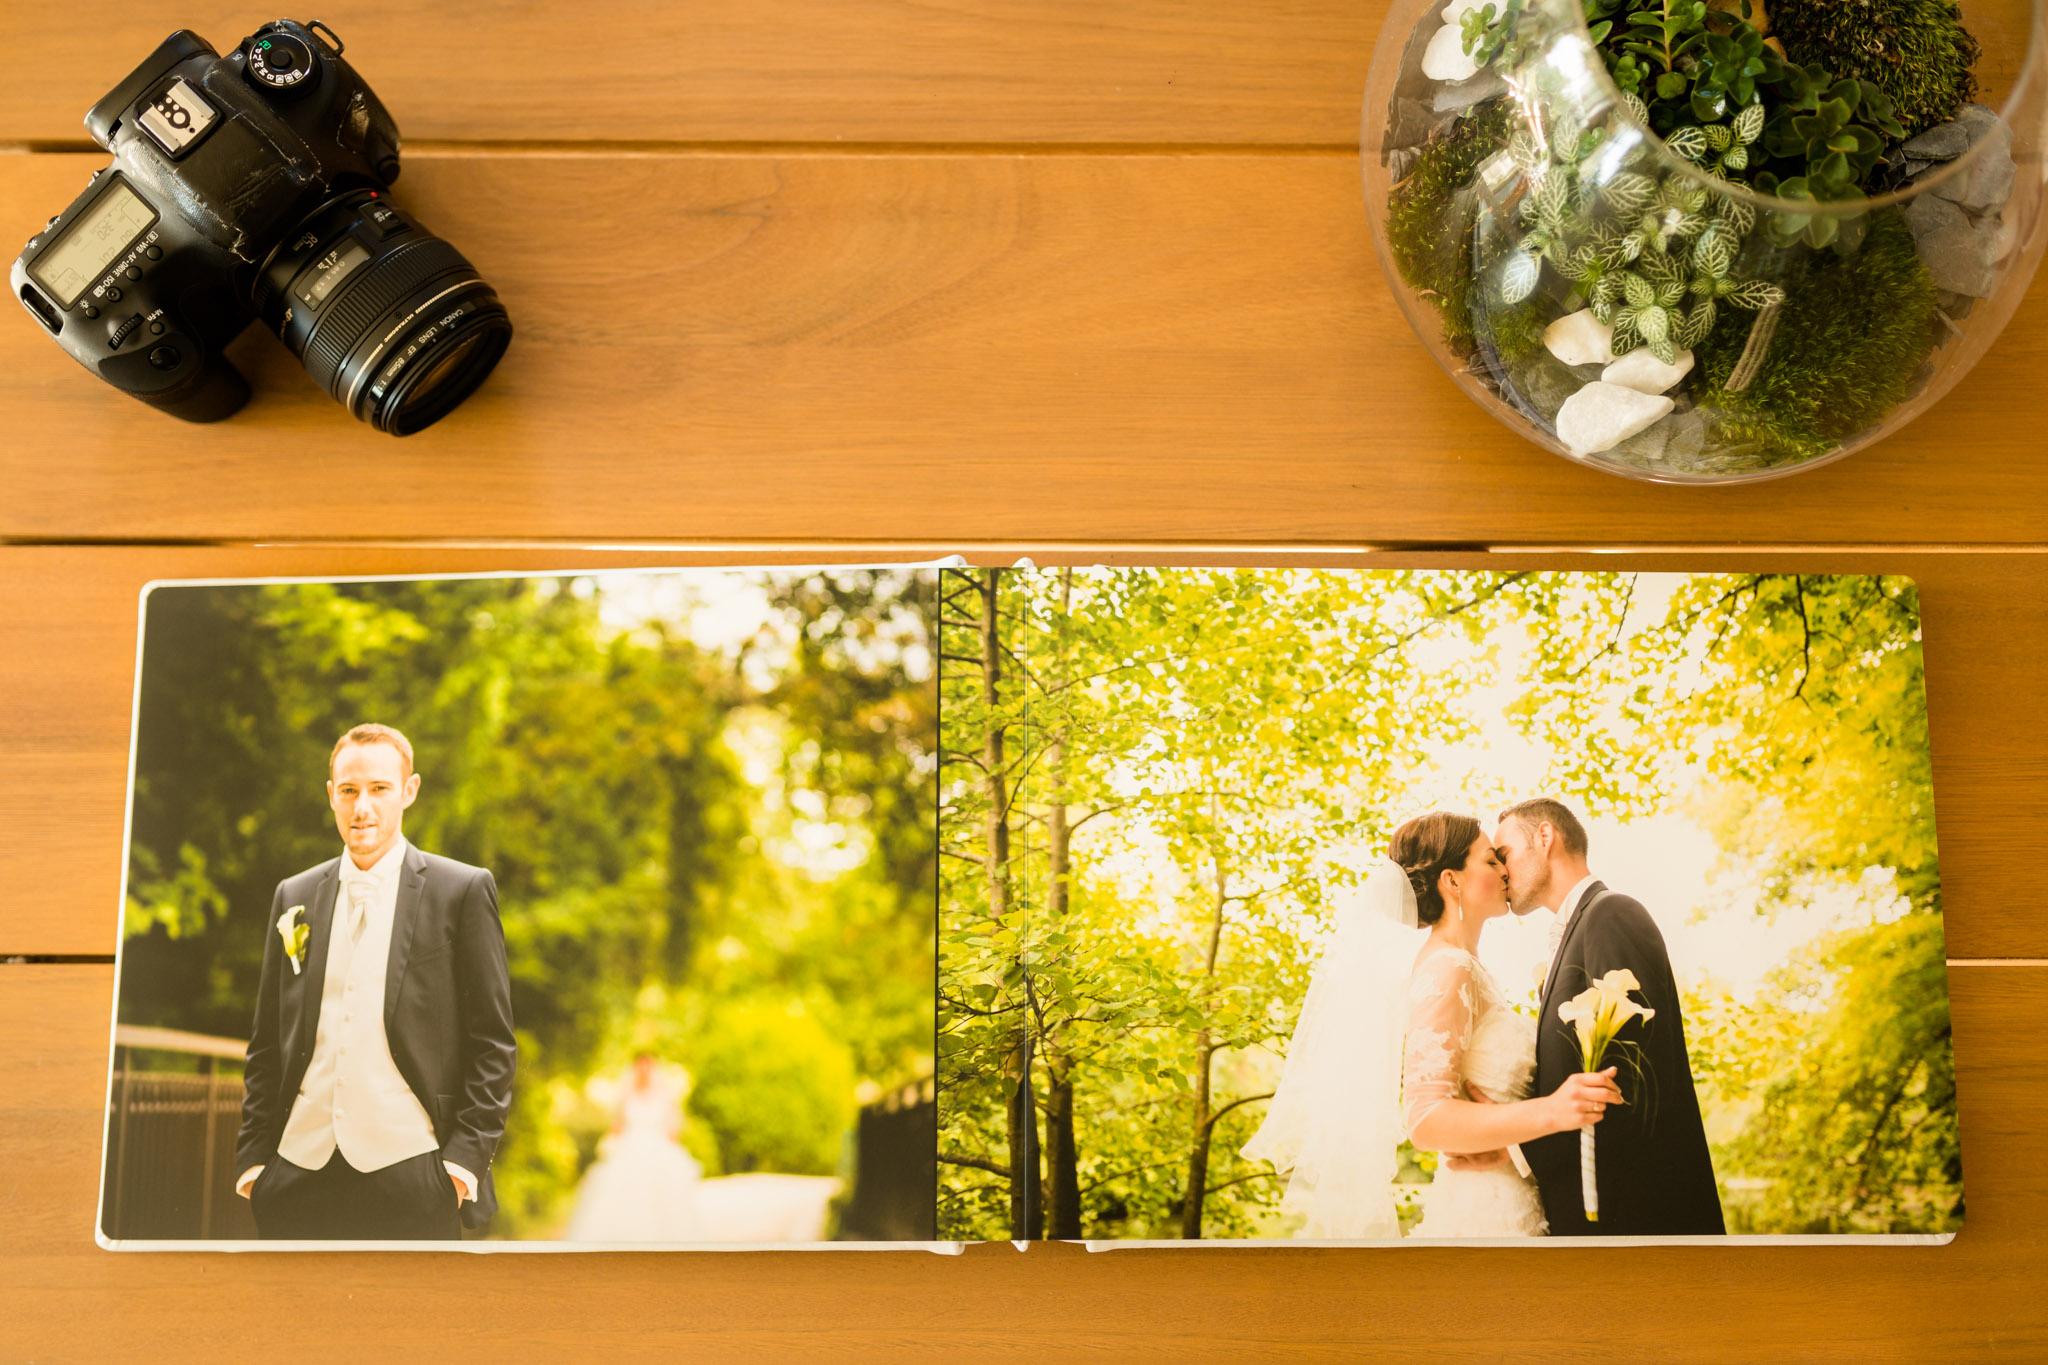 livre-photo-mariage-cuir-photographe-bordeaux-gironde-33_03